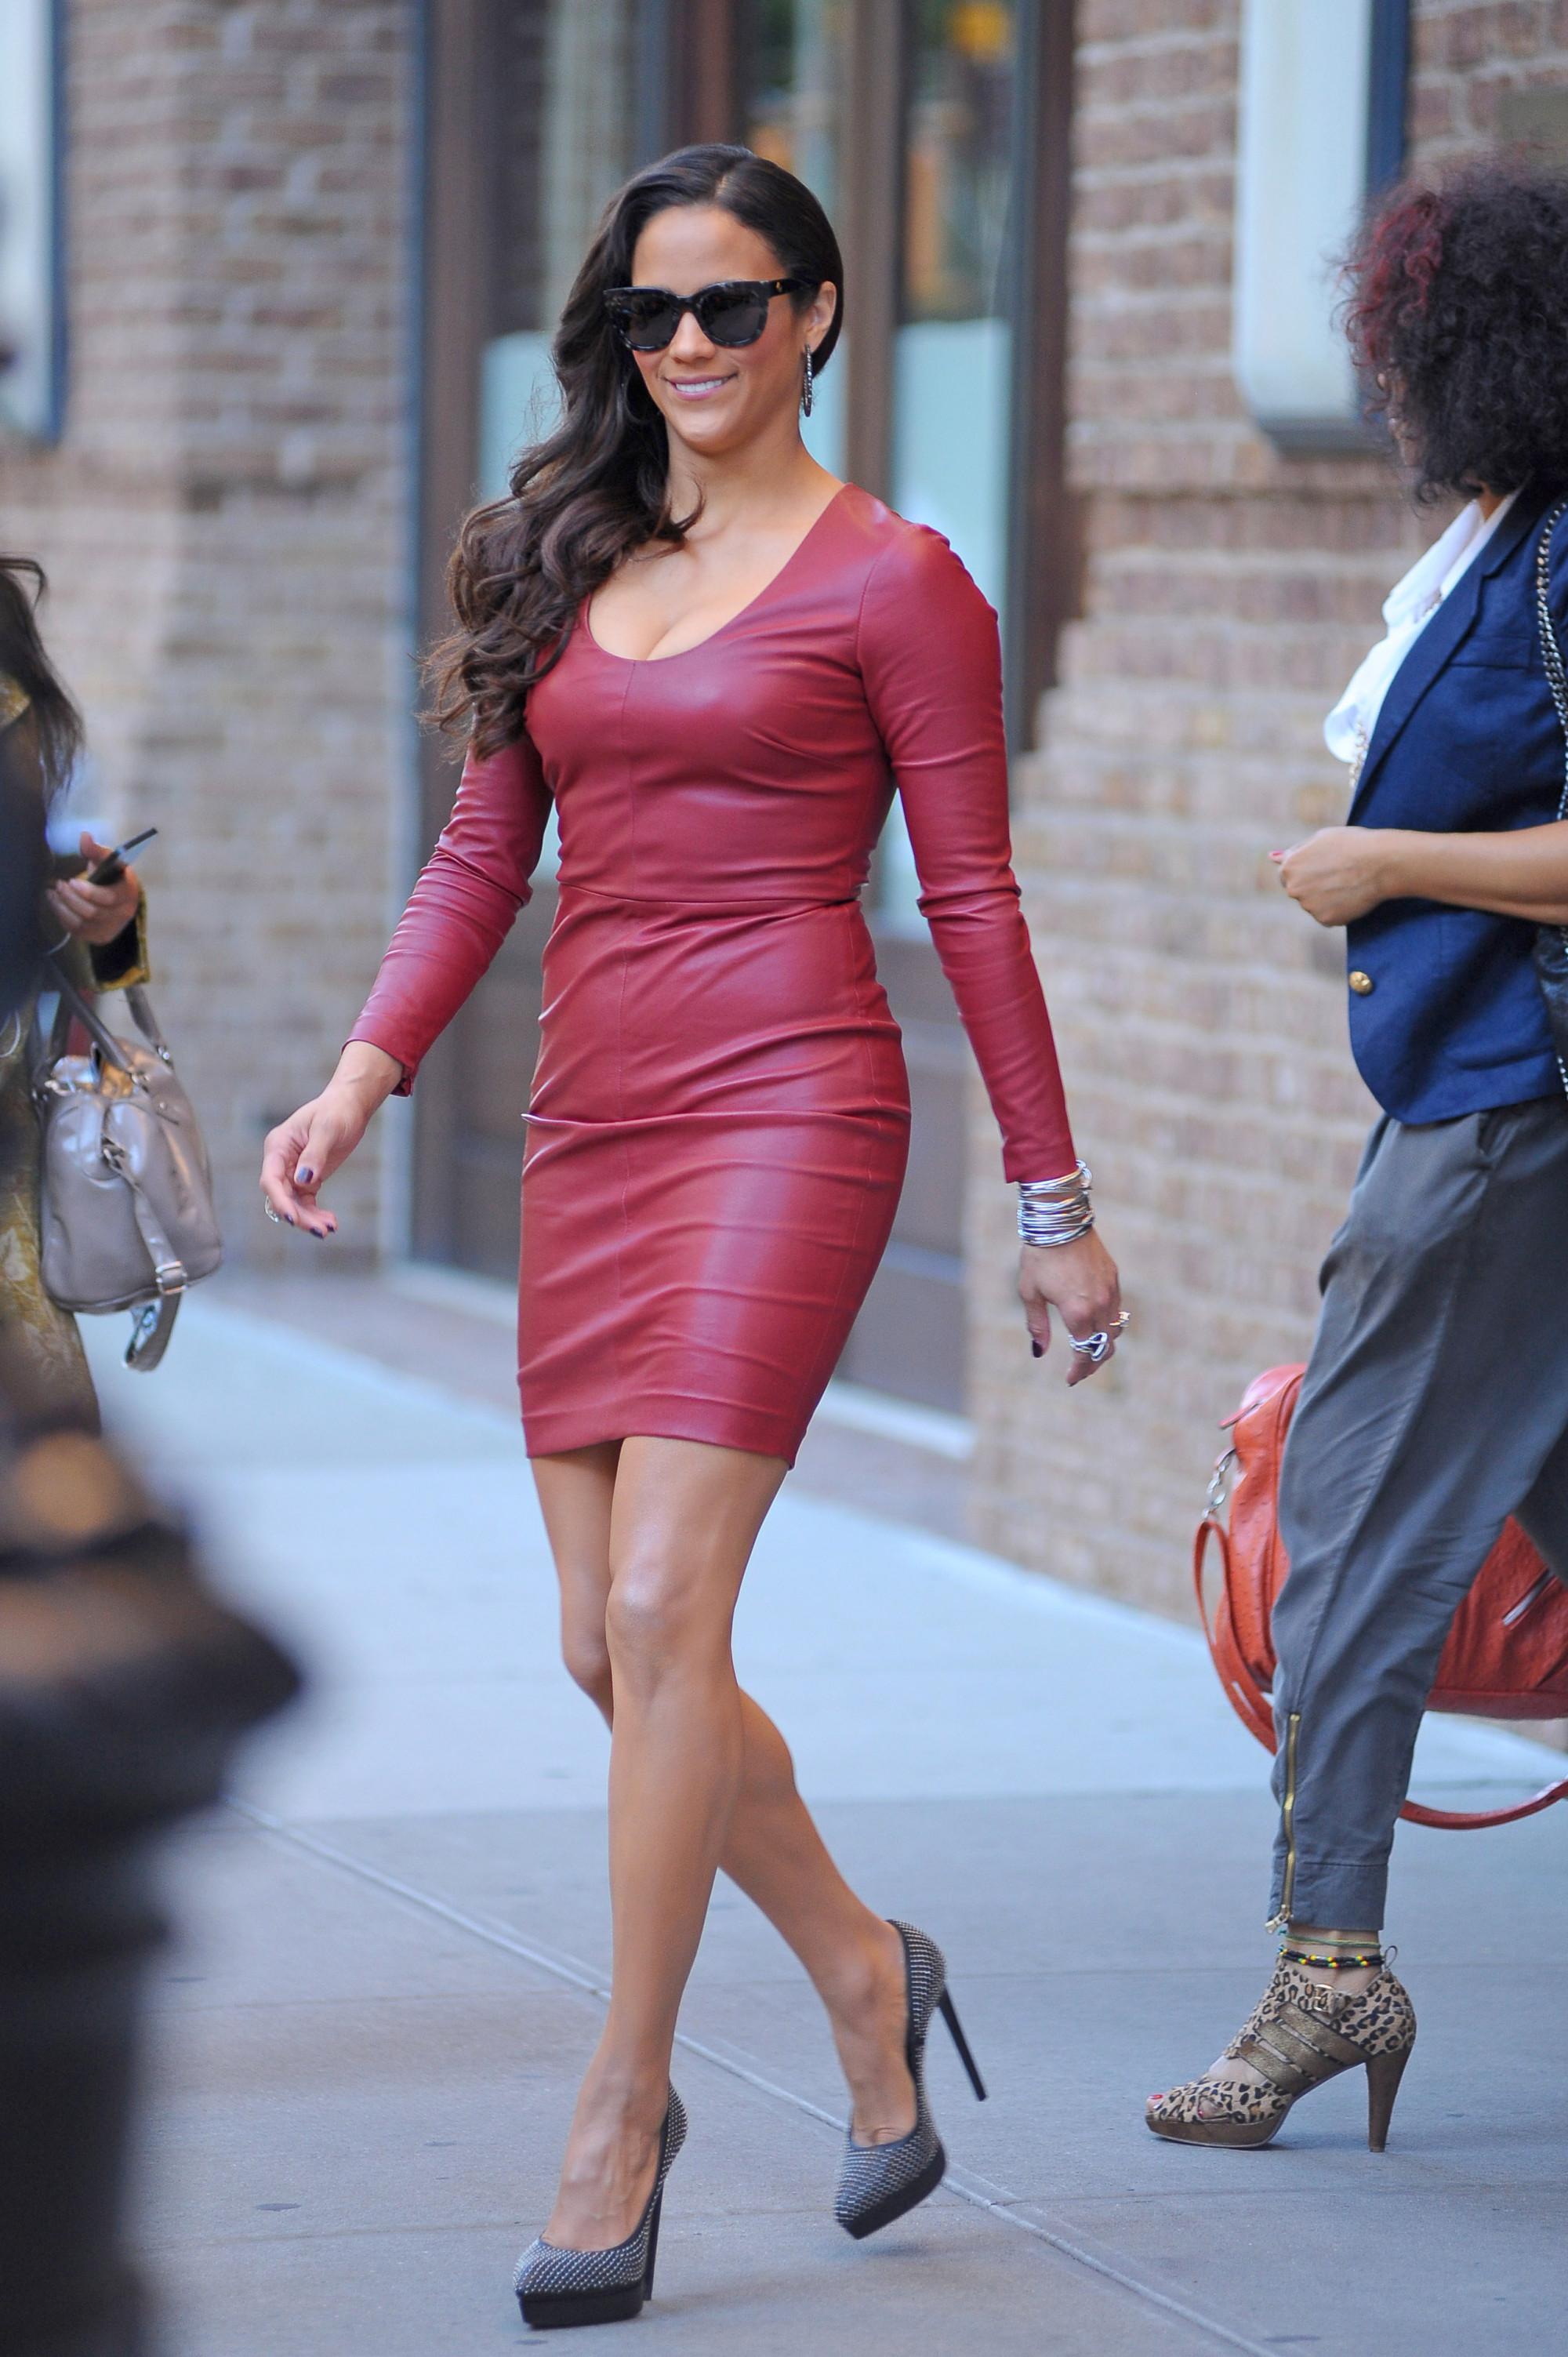 Paula Patton Rocks A Leather Dress In New York City  Huffpost-9925